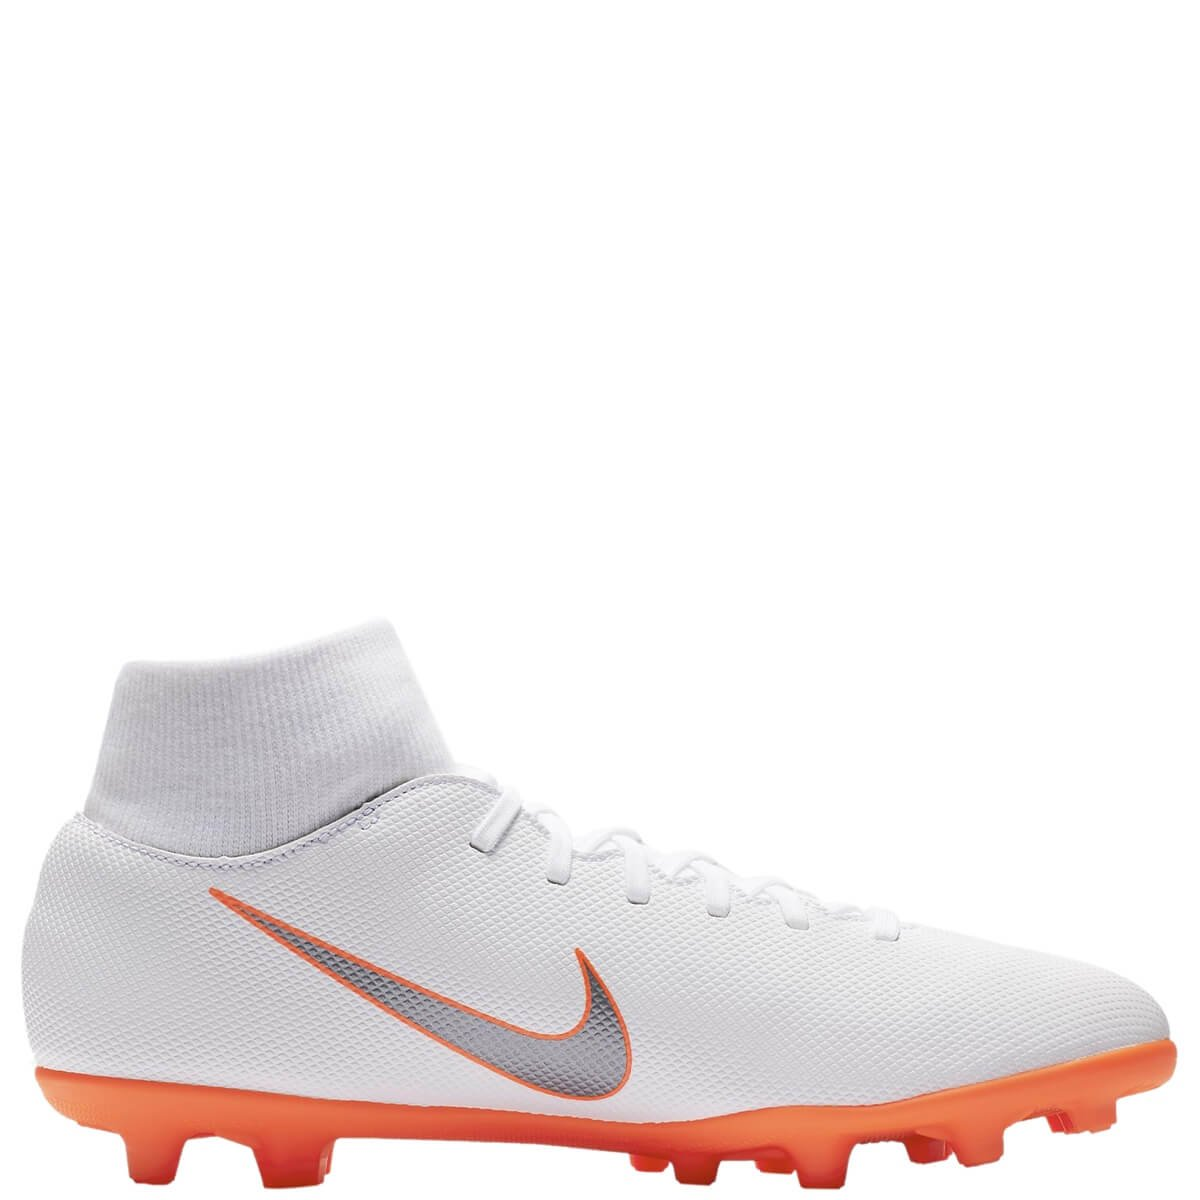 c76289ae80af5 Bizz Store - Chuteira Futebol de Campo Nike Superfly 6 Club